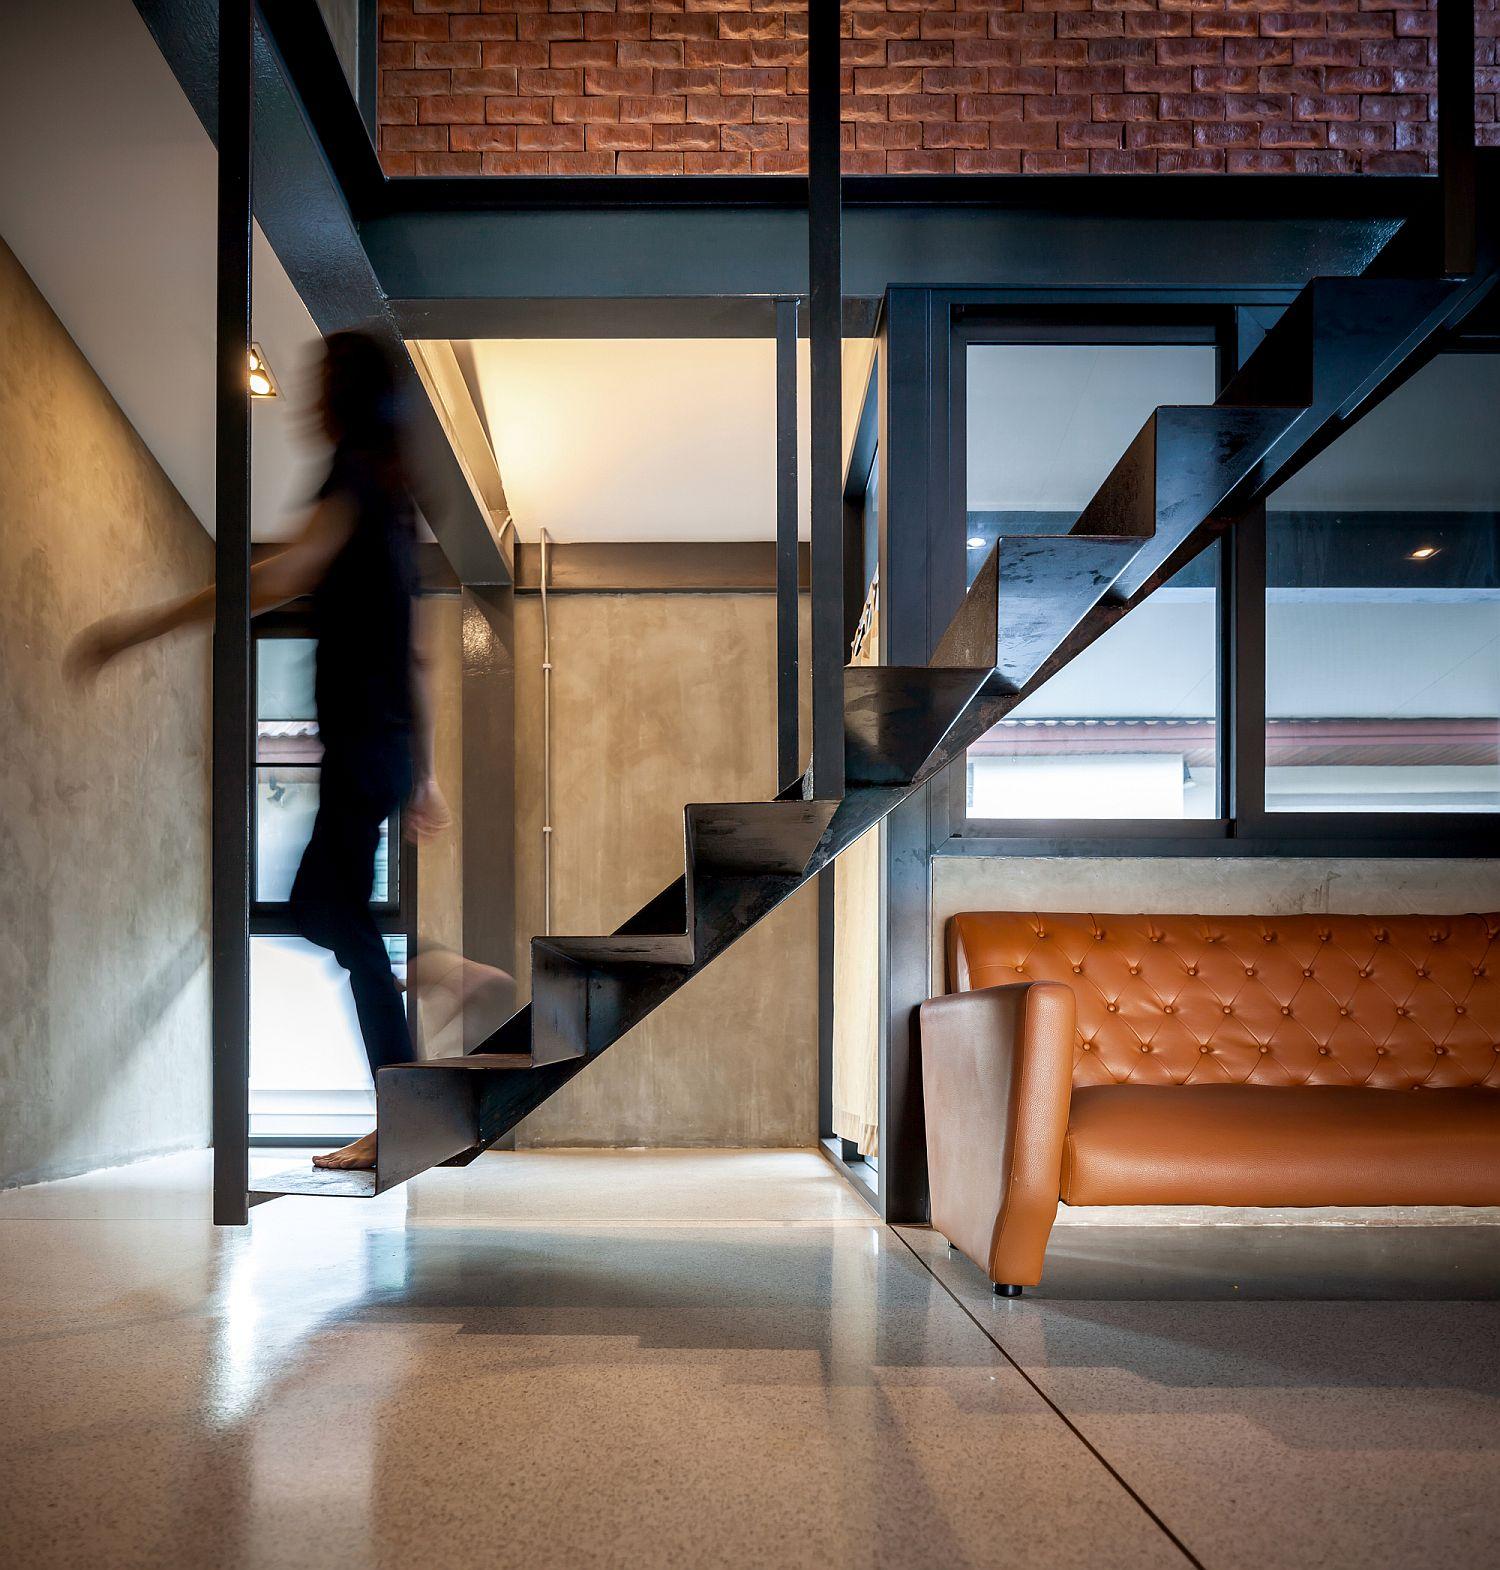 Fabulous-stairway-that-feels-like-it-is-floating-in-mid-air